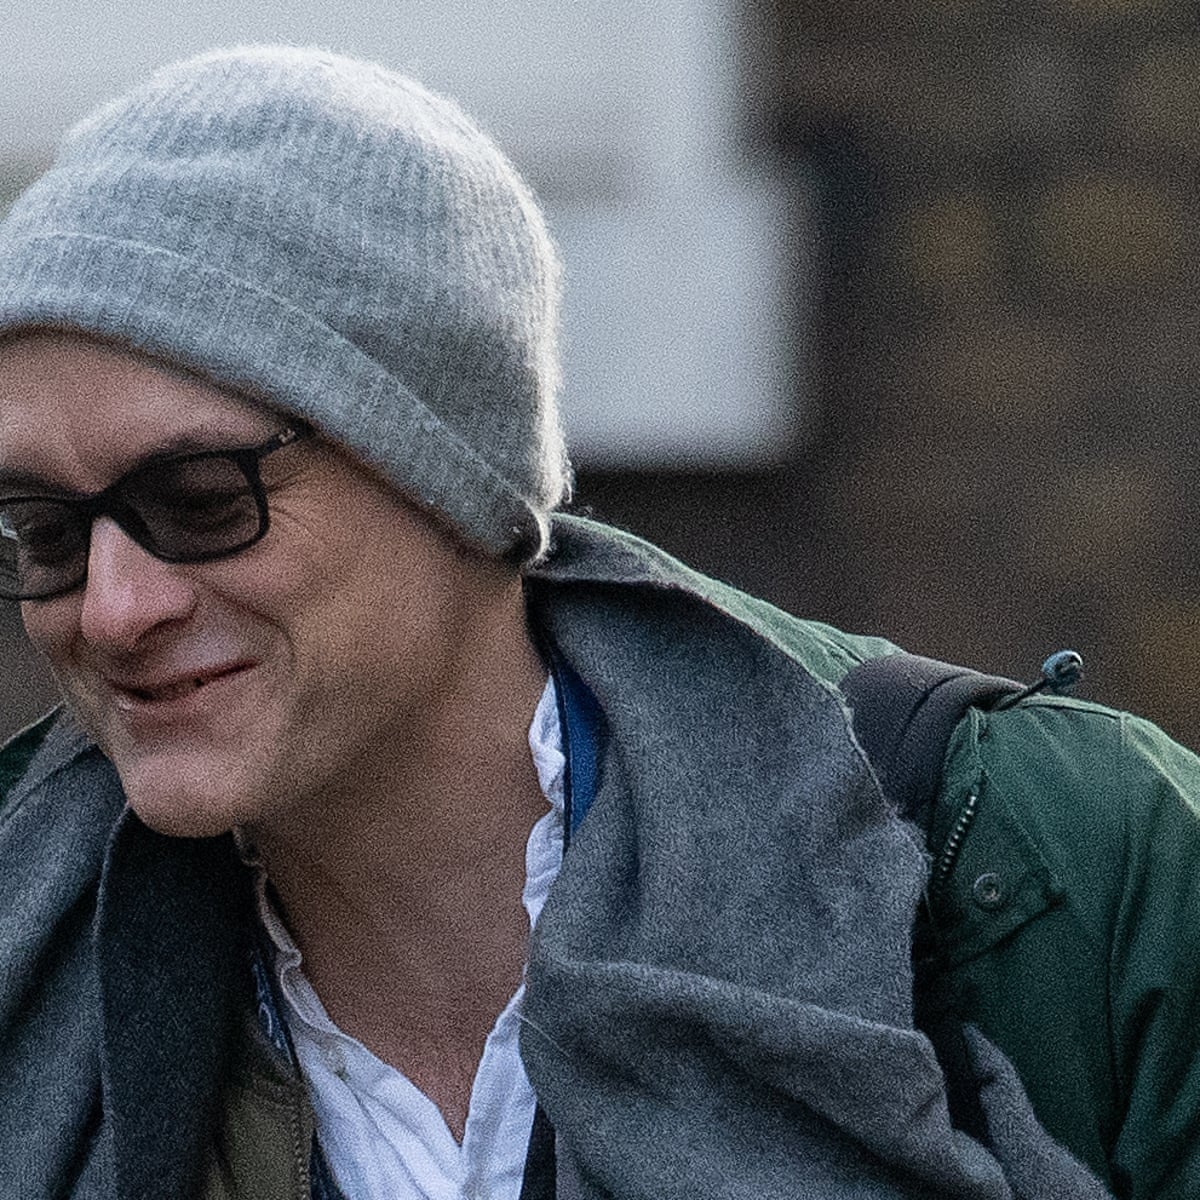 Sabisky Row Dominic Cummings Criticised Over Designer Babies Post Politics The Guardian